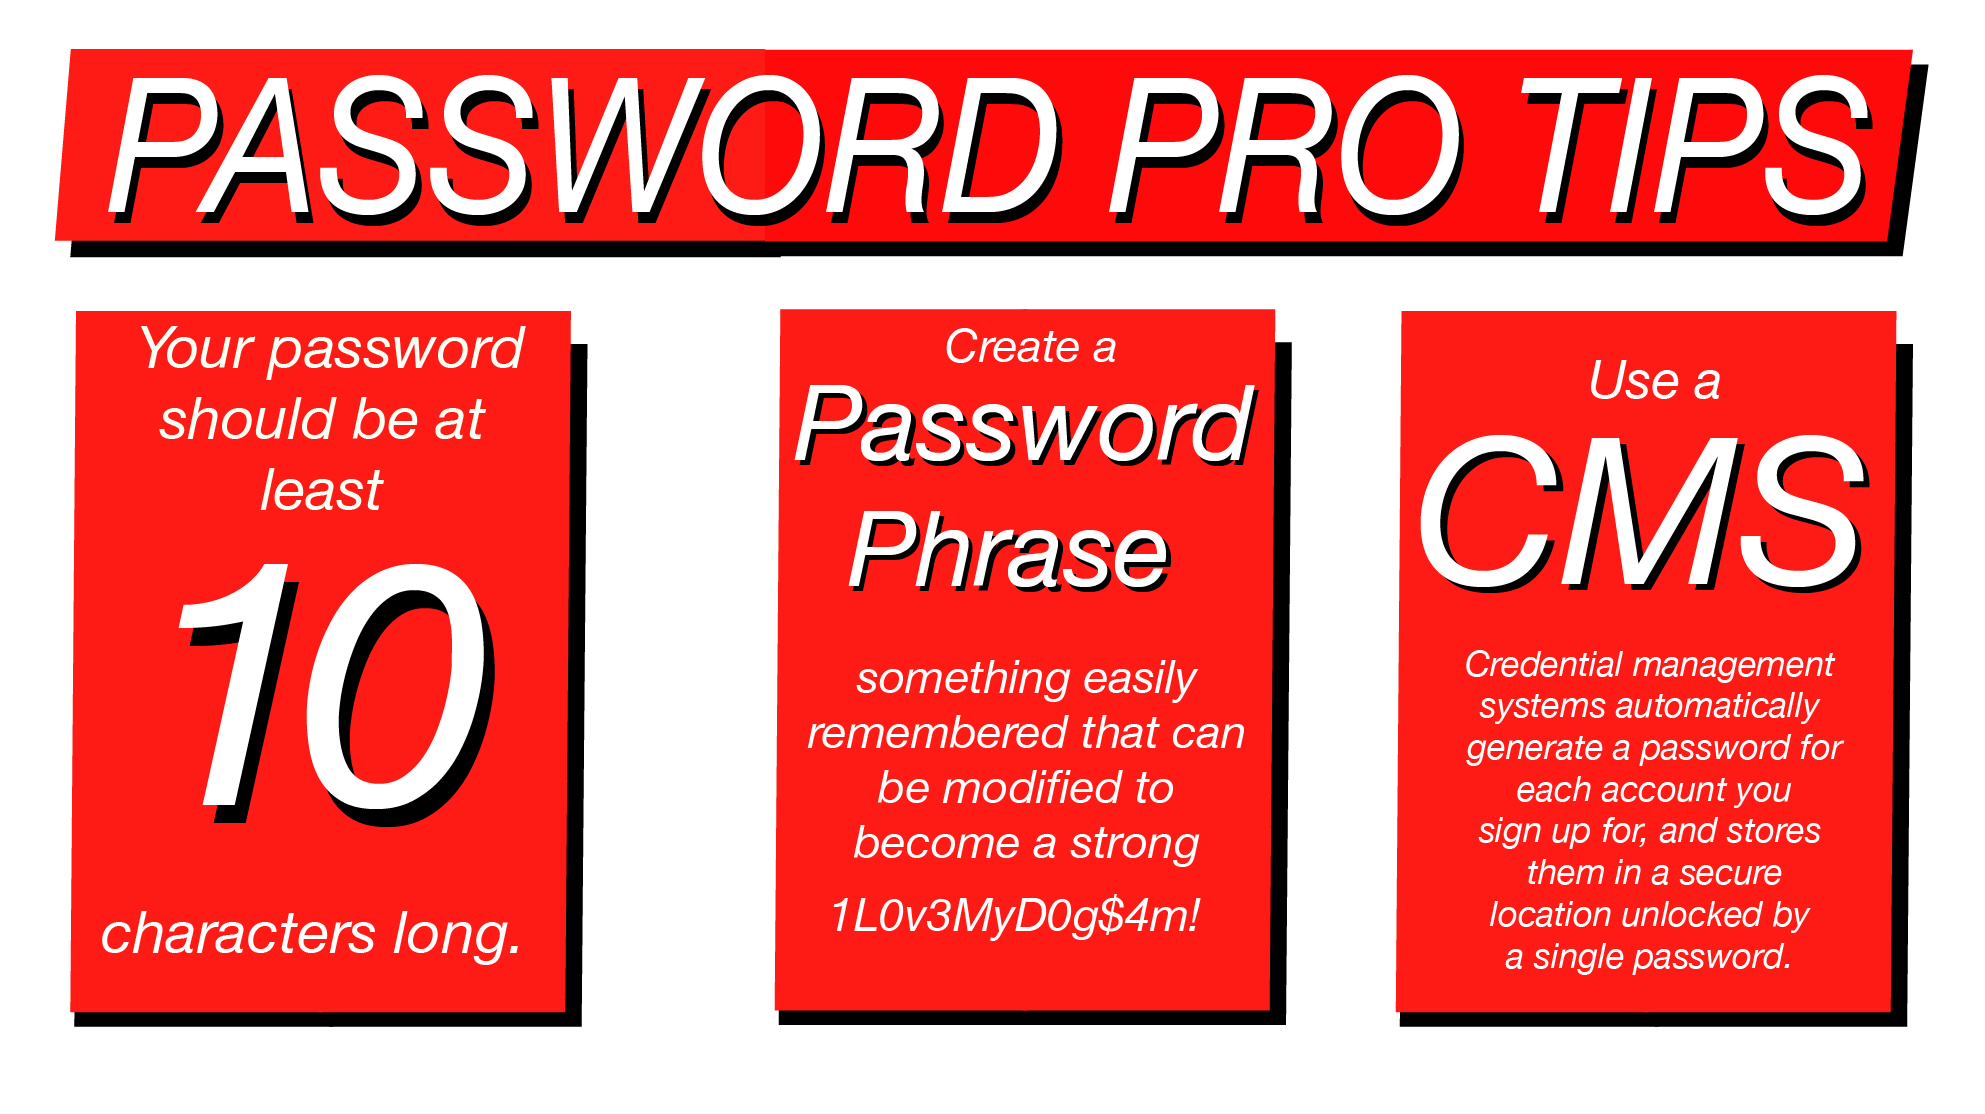 Passwords Pro Tips